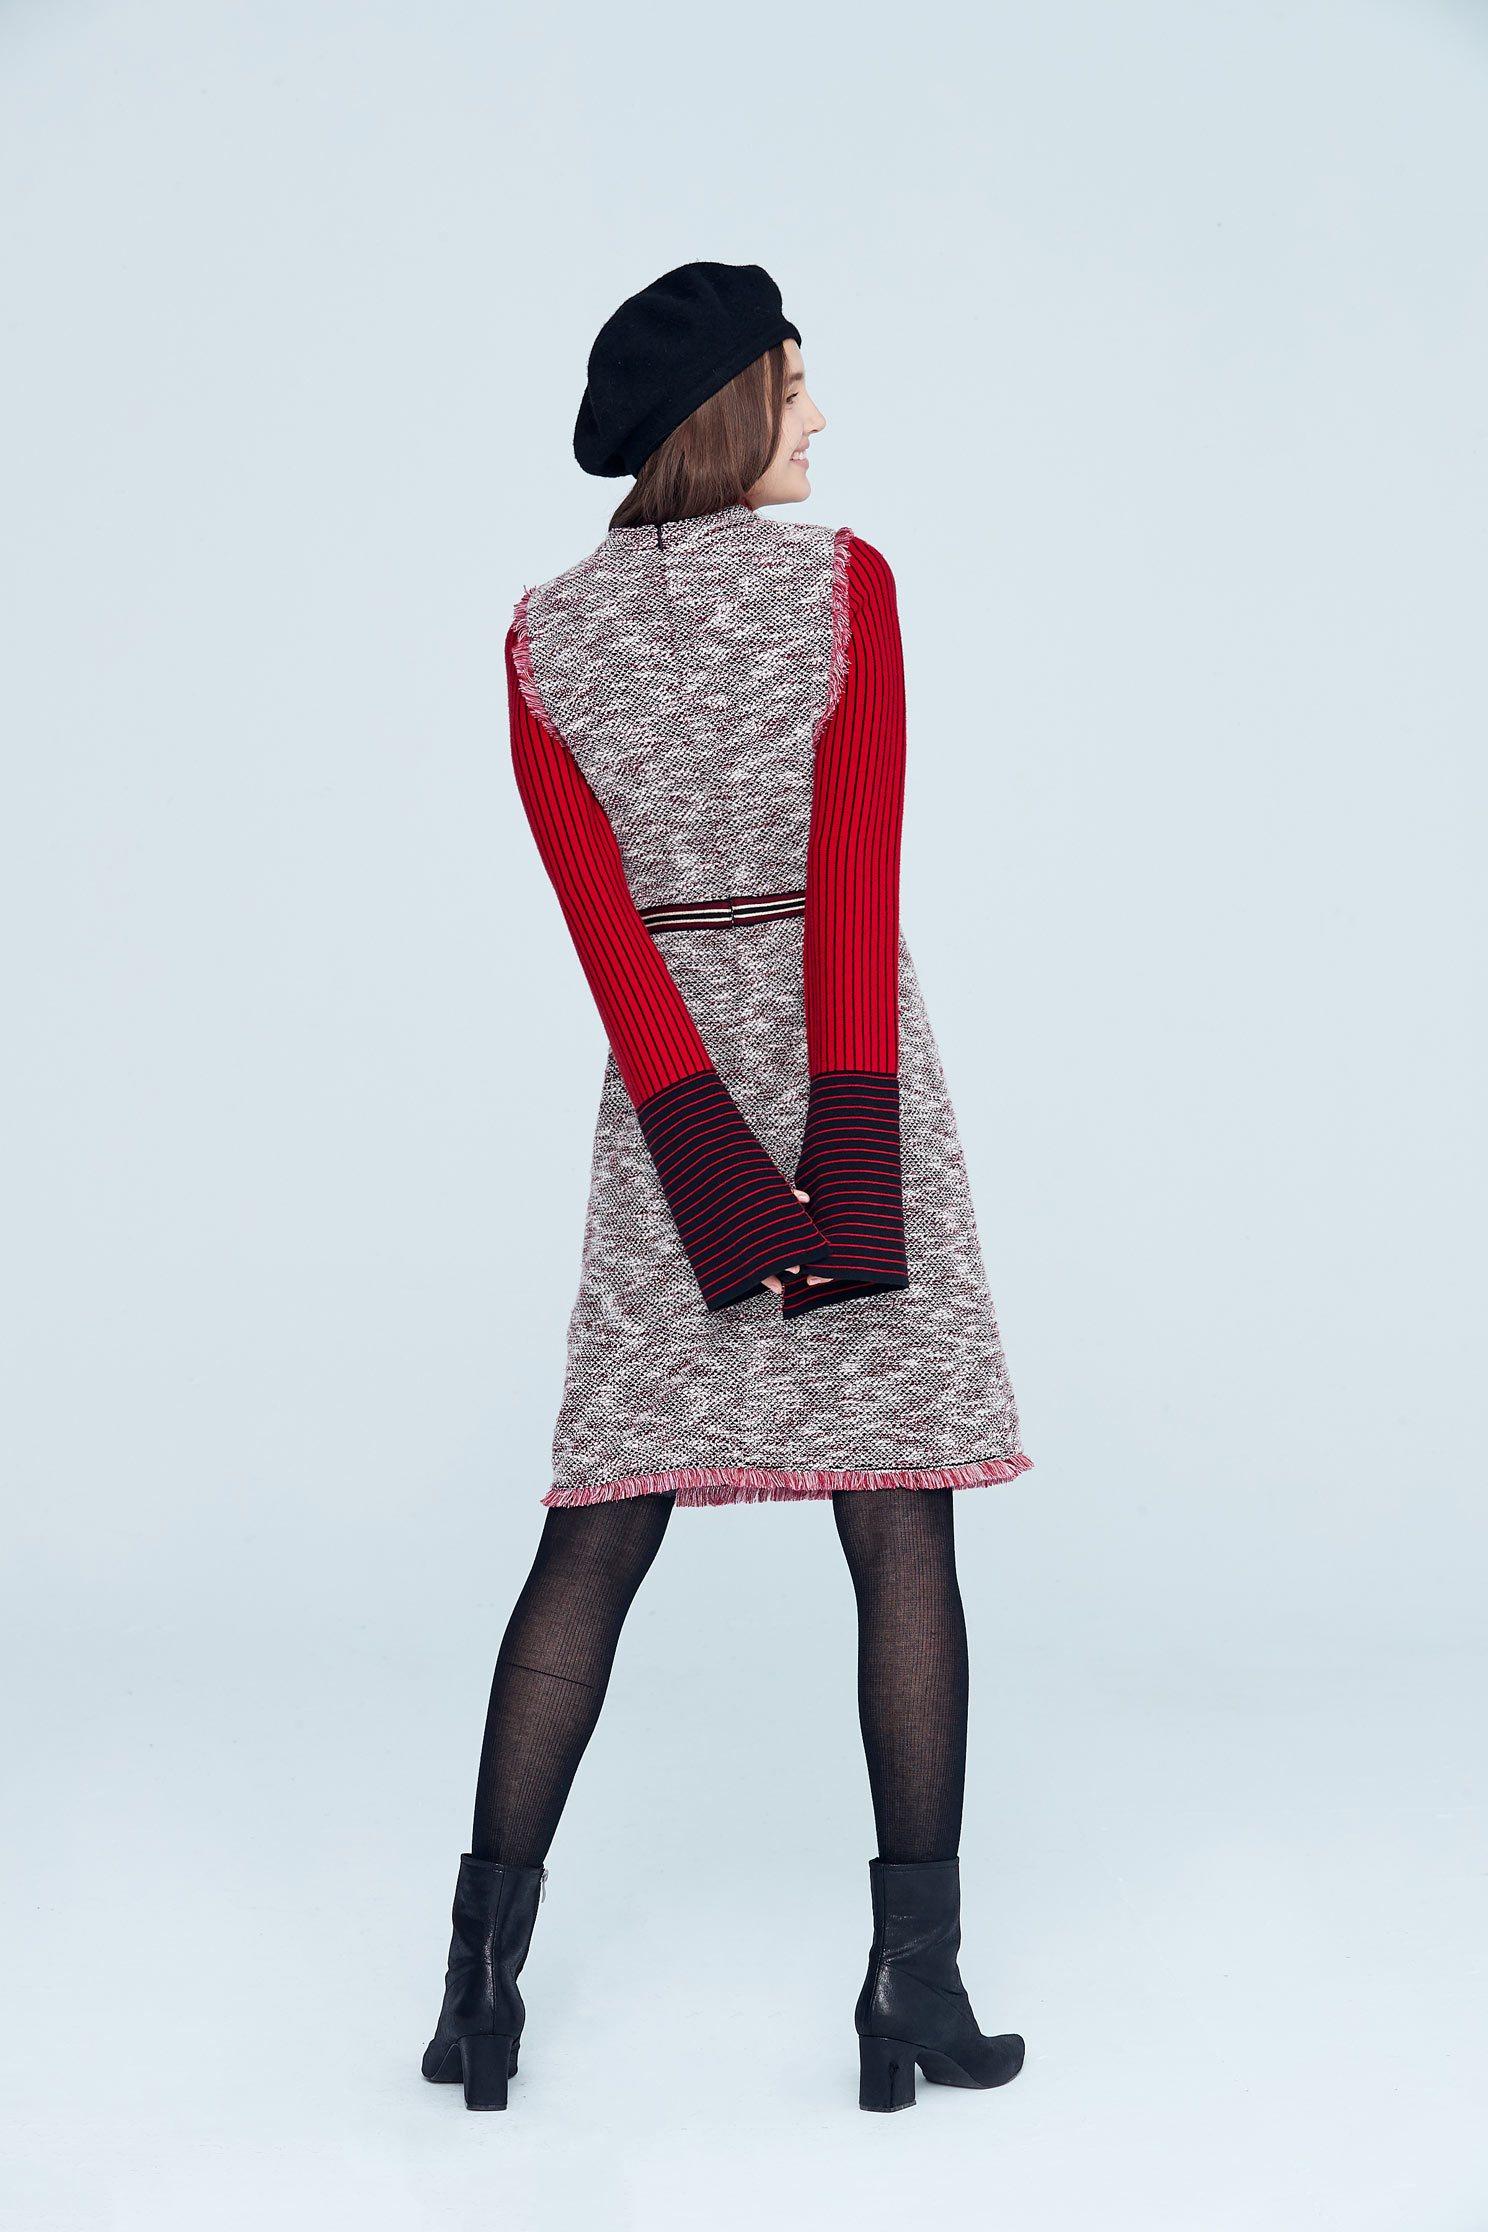 Elegant vintage classic design sleeveless dress,cocktaildress,sleevelessdress,onepiecedress,knitting,knitteddress